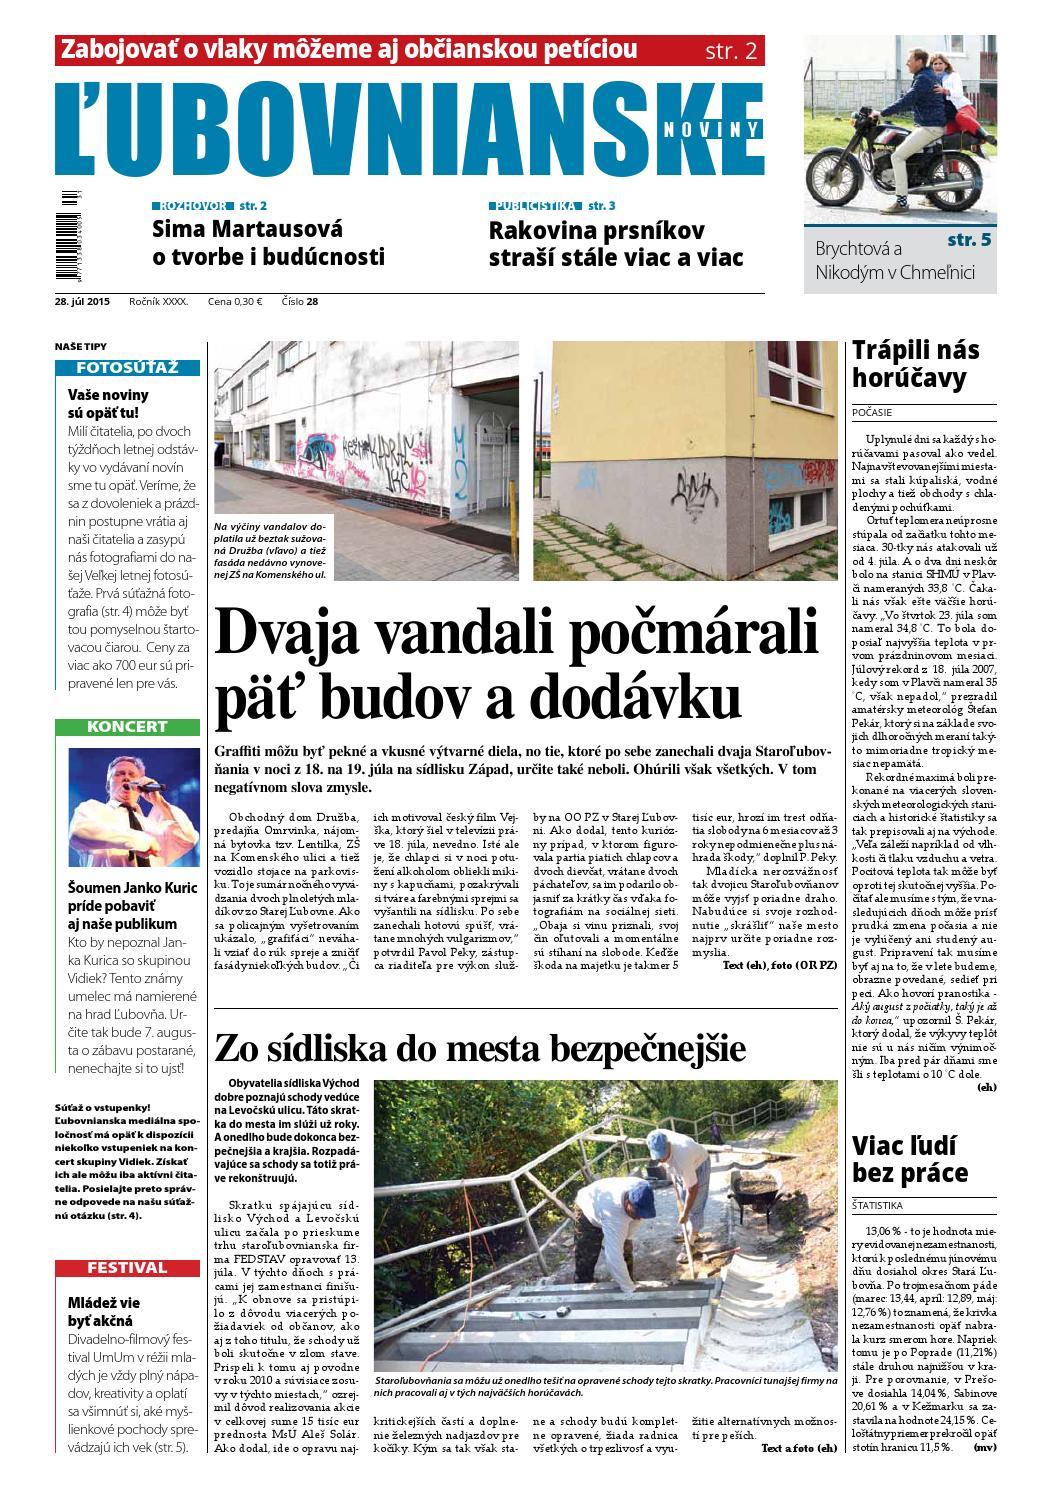 Ľubovnianske noviny č. 28 2015 by Vladimir Zima - issuu ab5619ca421